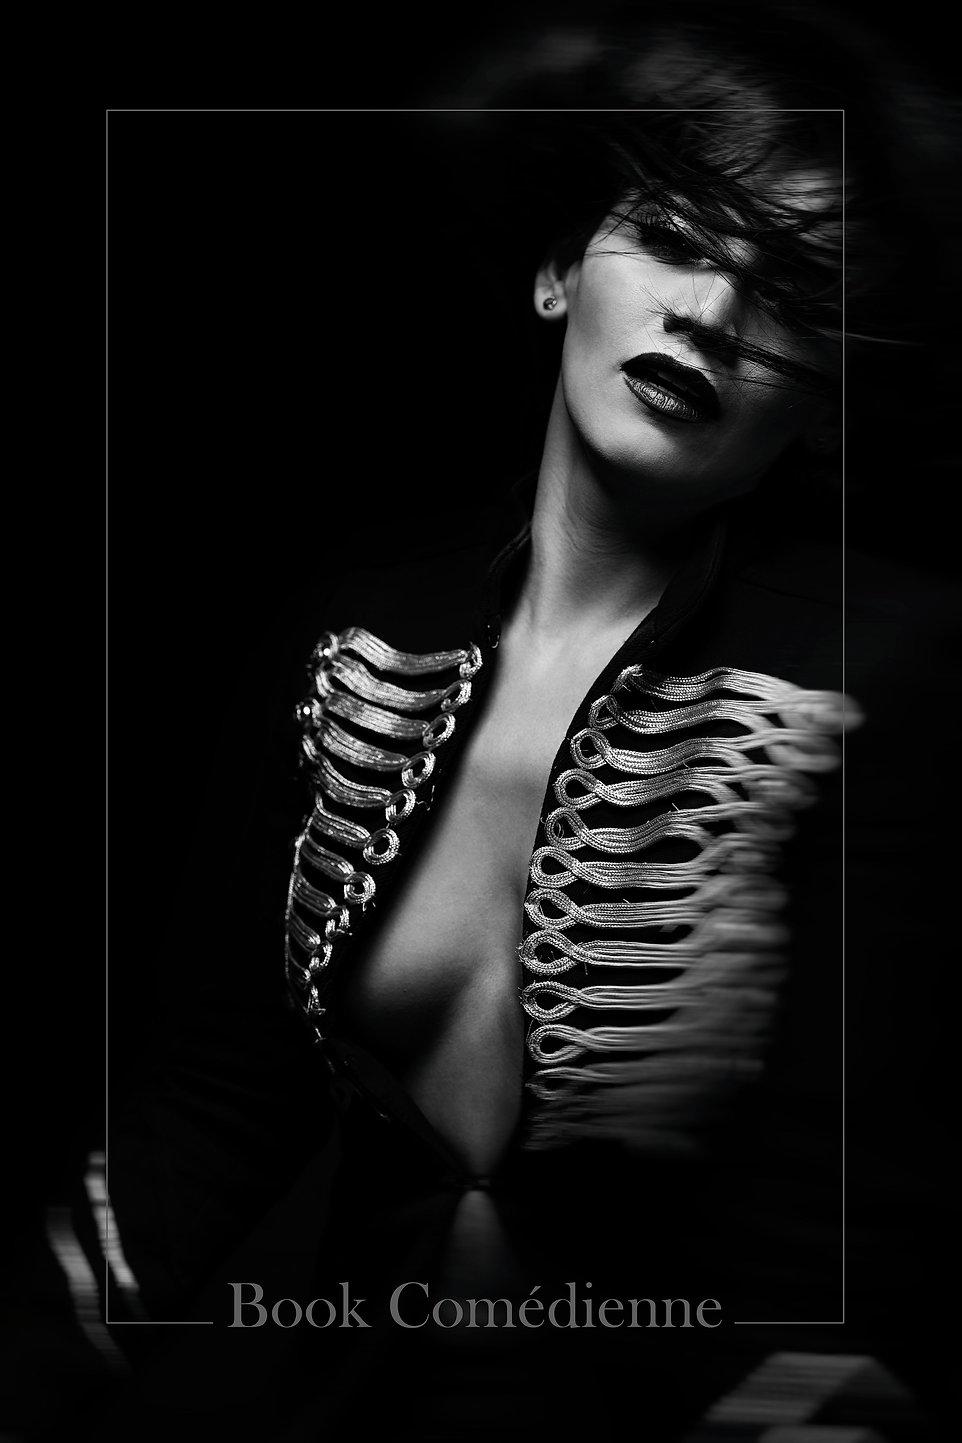 magazine,fashion,russian,black,bnw,beauty,hair,blackhair,sensual